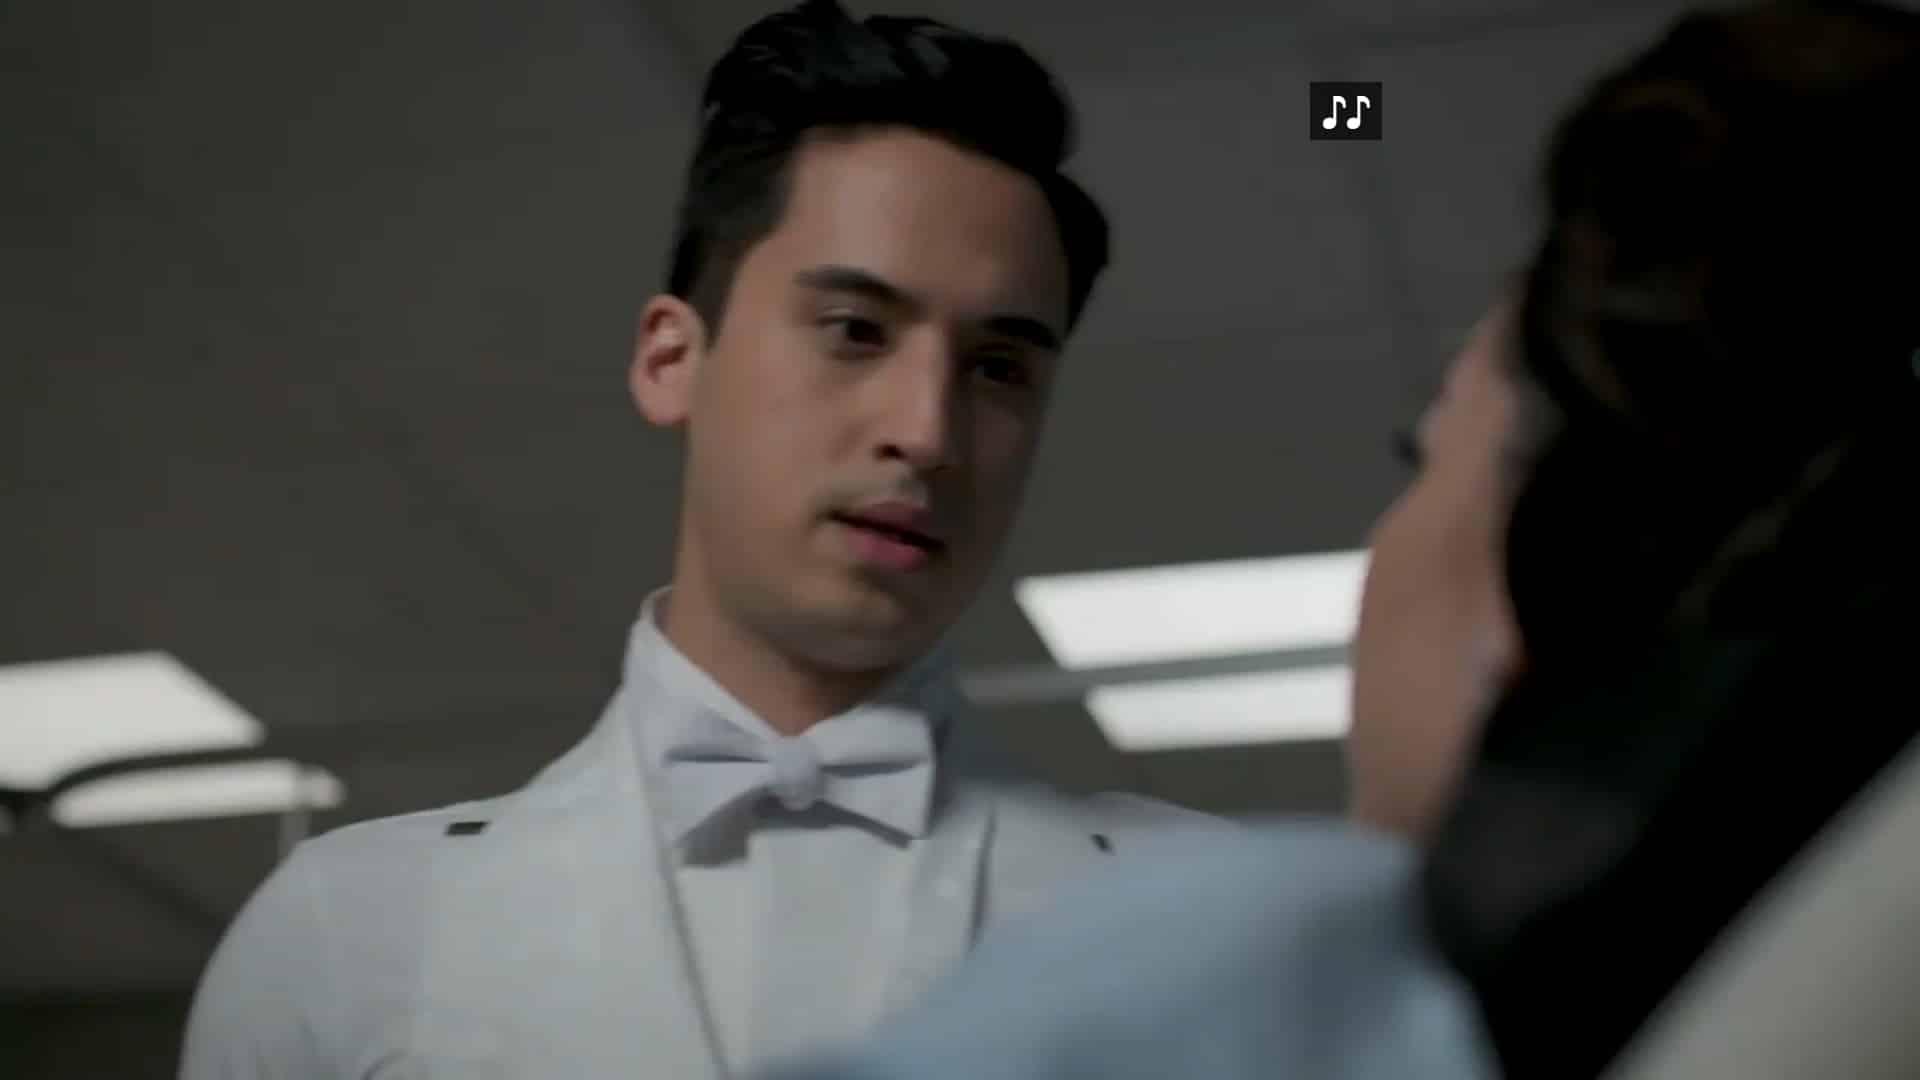 Leo (Michael Hsu Rosen) worried about his dancing partner, Maya